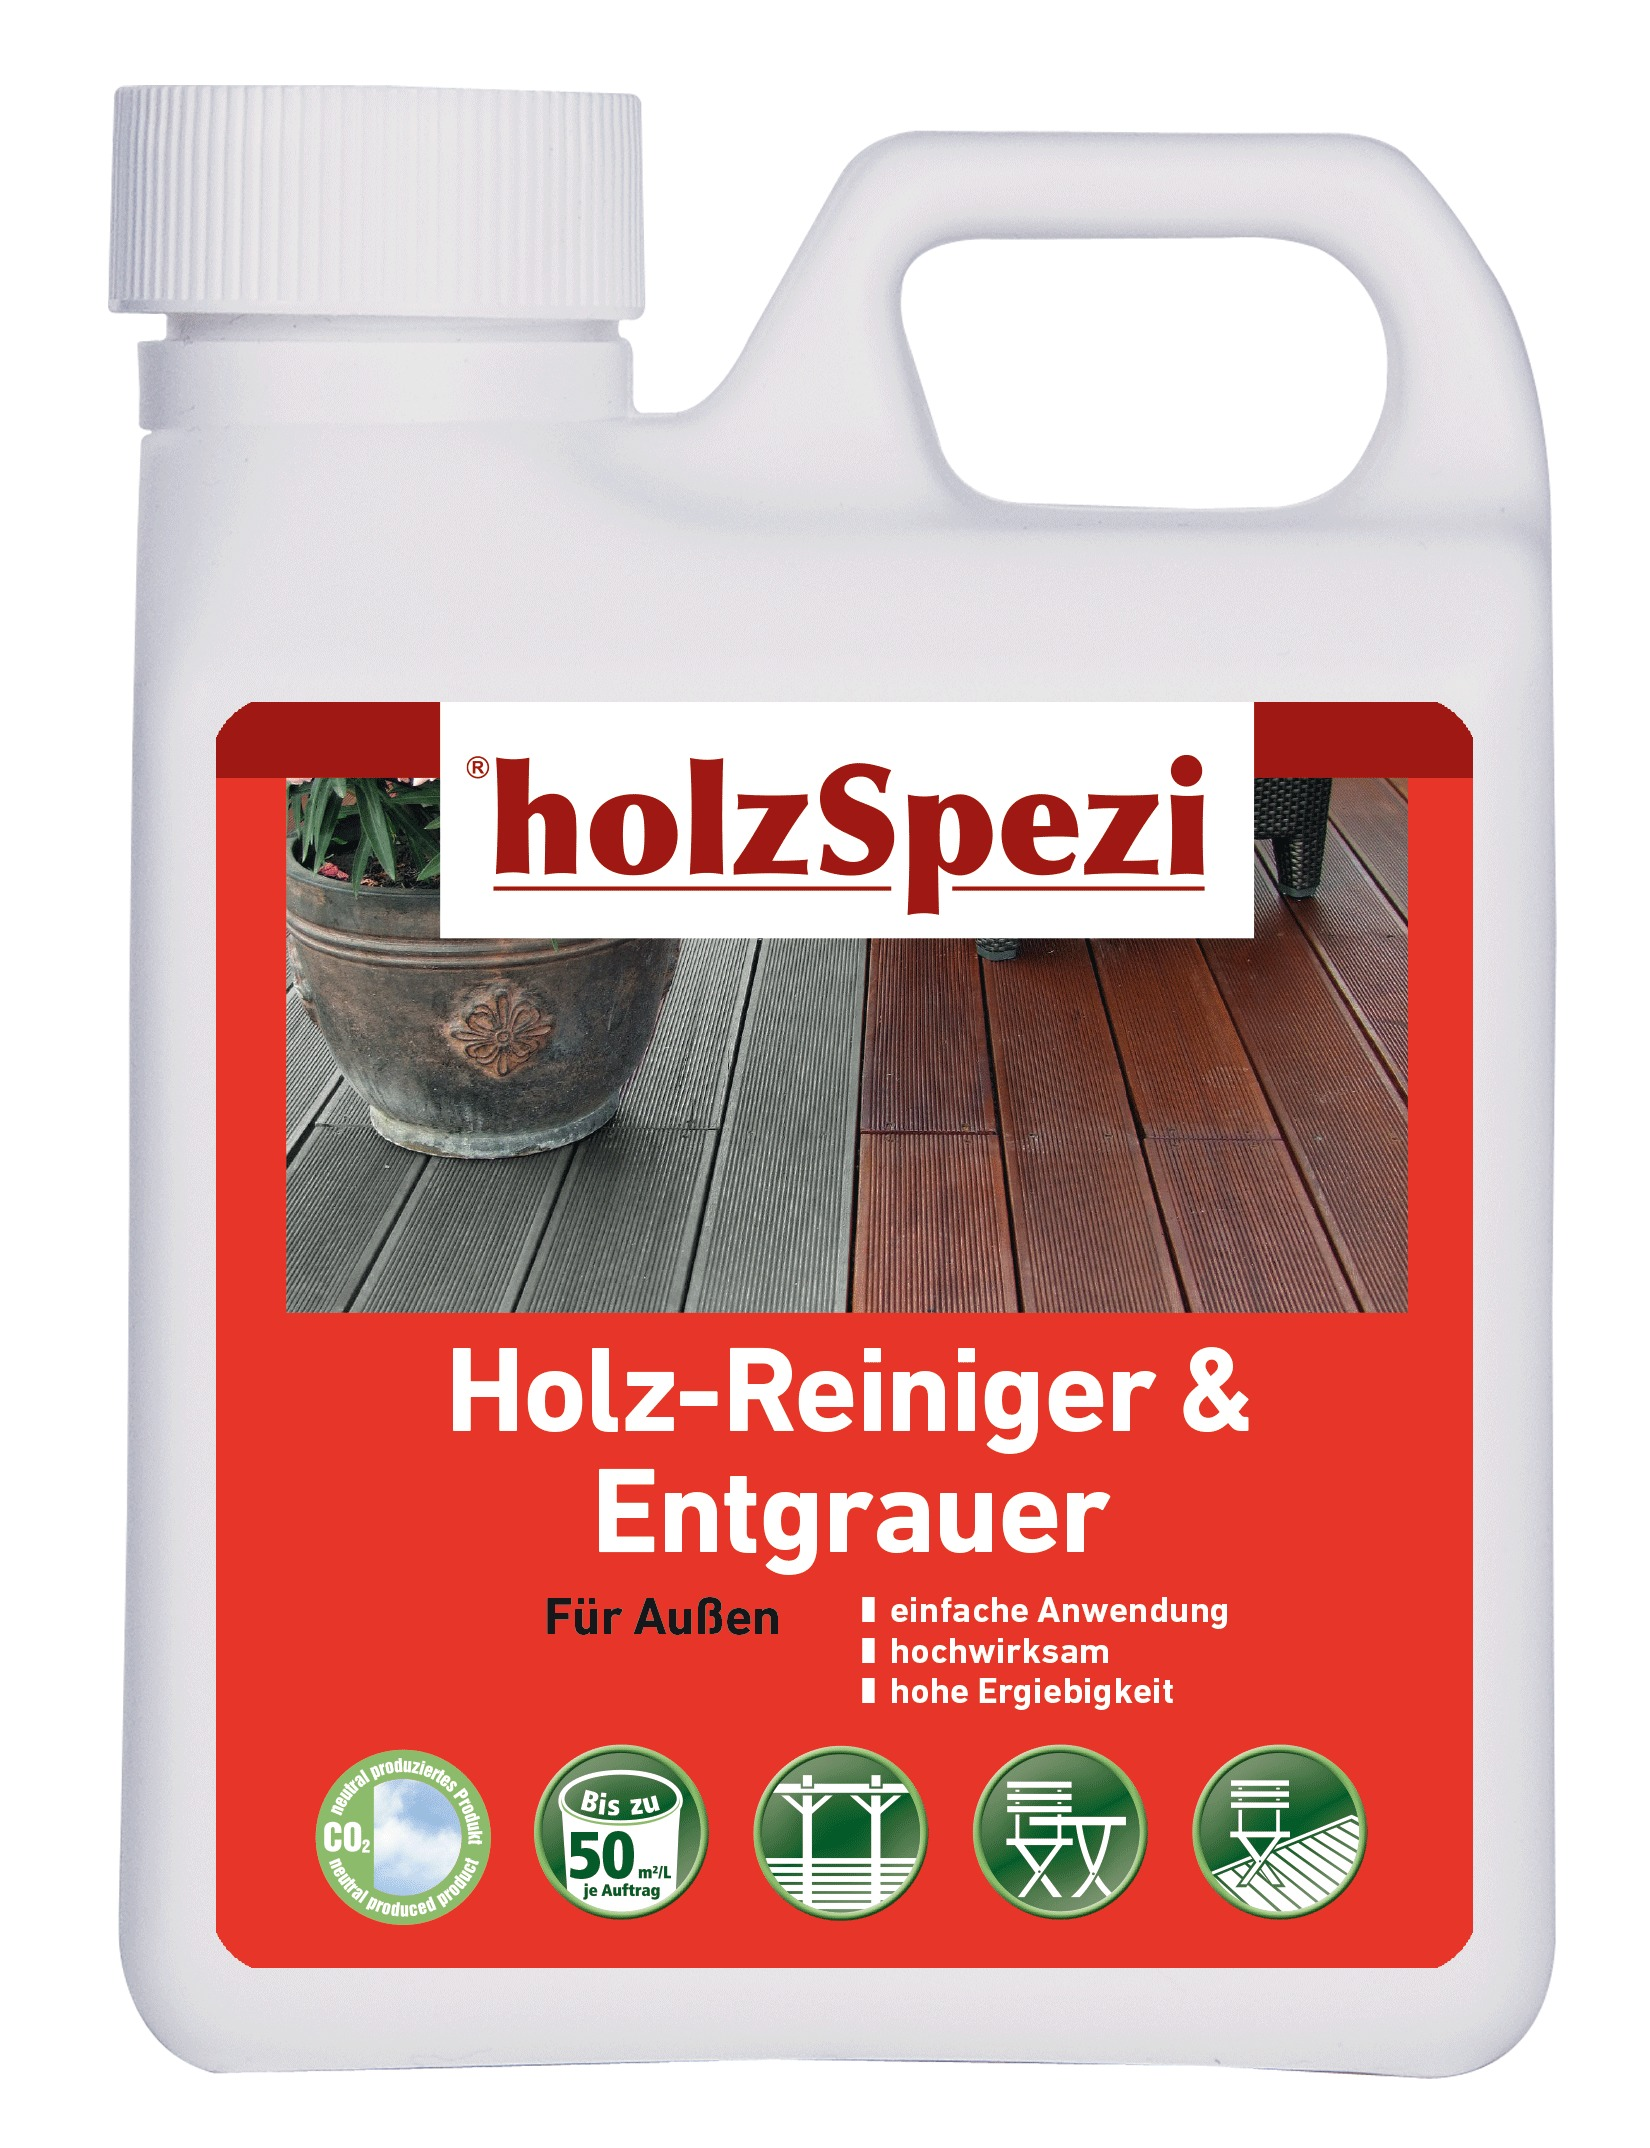 holzSpezi Holz-Reiniger & Entgrauer (farblos 1 Liter)